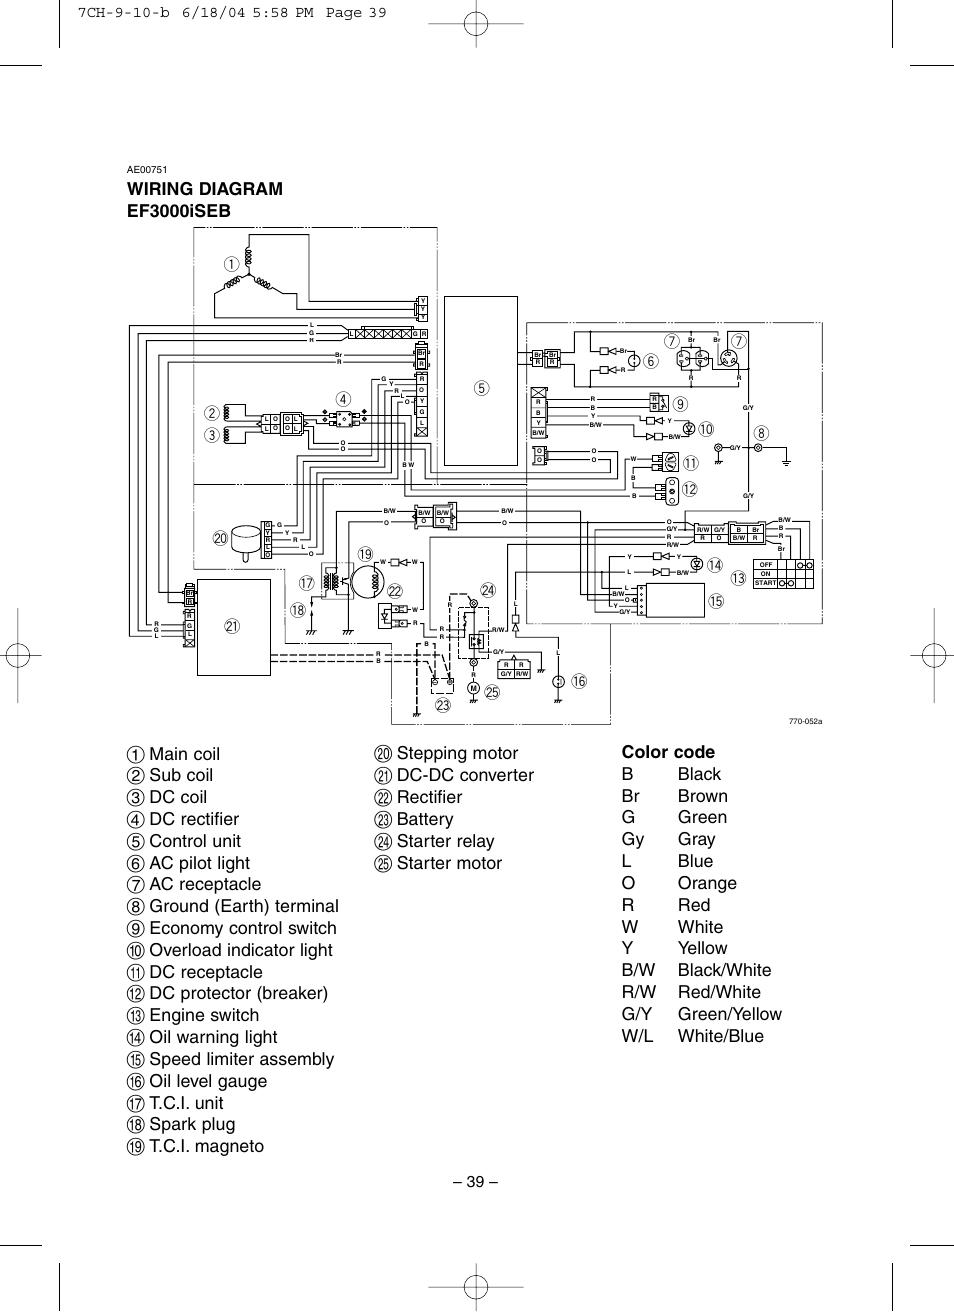 Yamaha Generator Wiring Diagram : Yamaha Ef4000dve